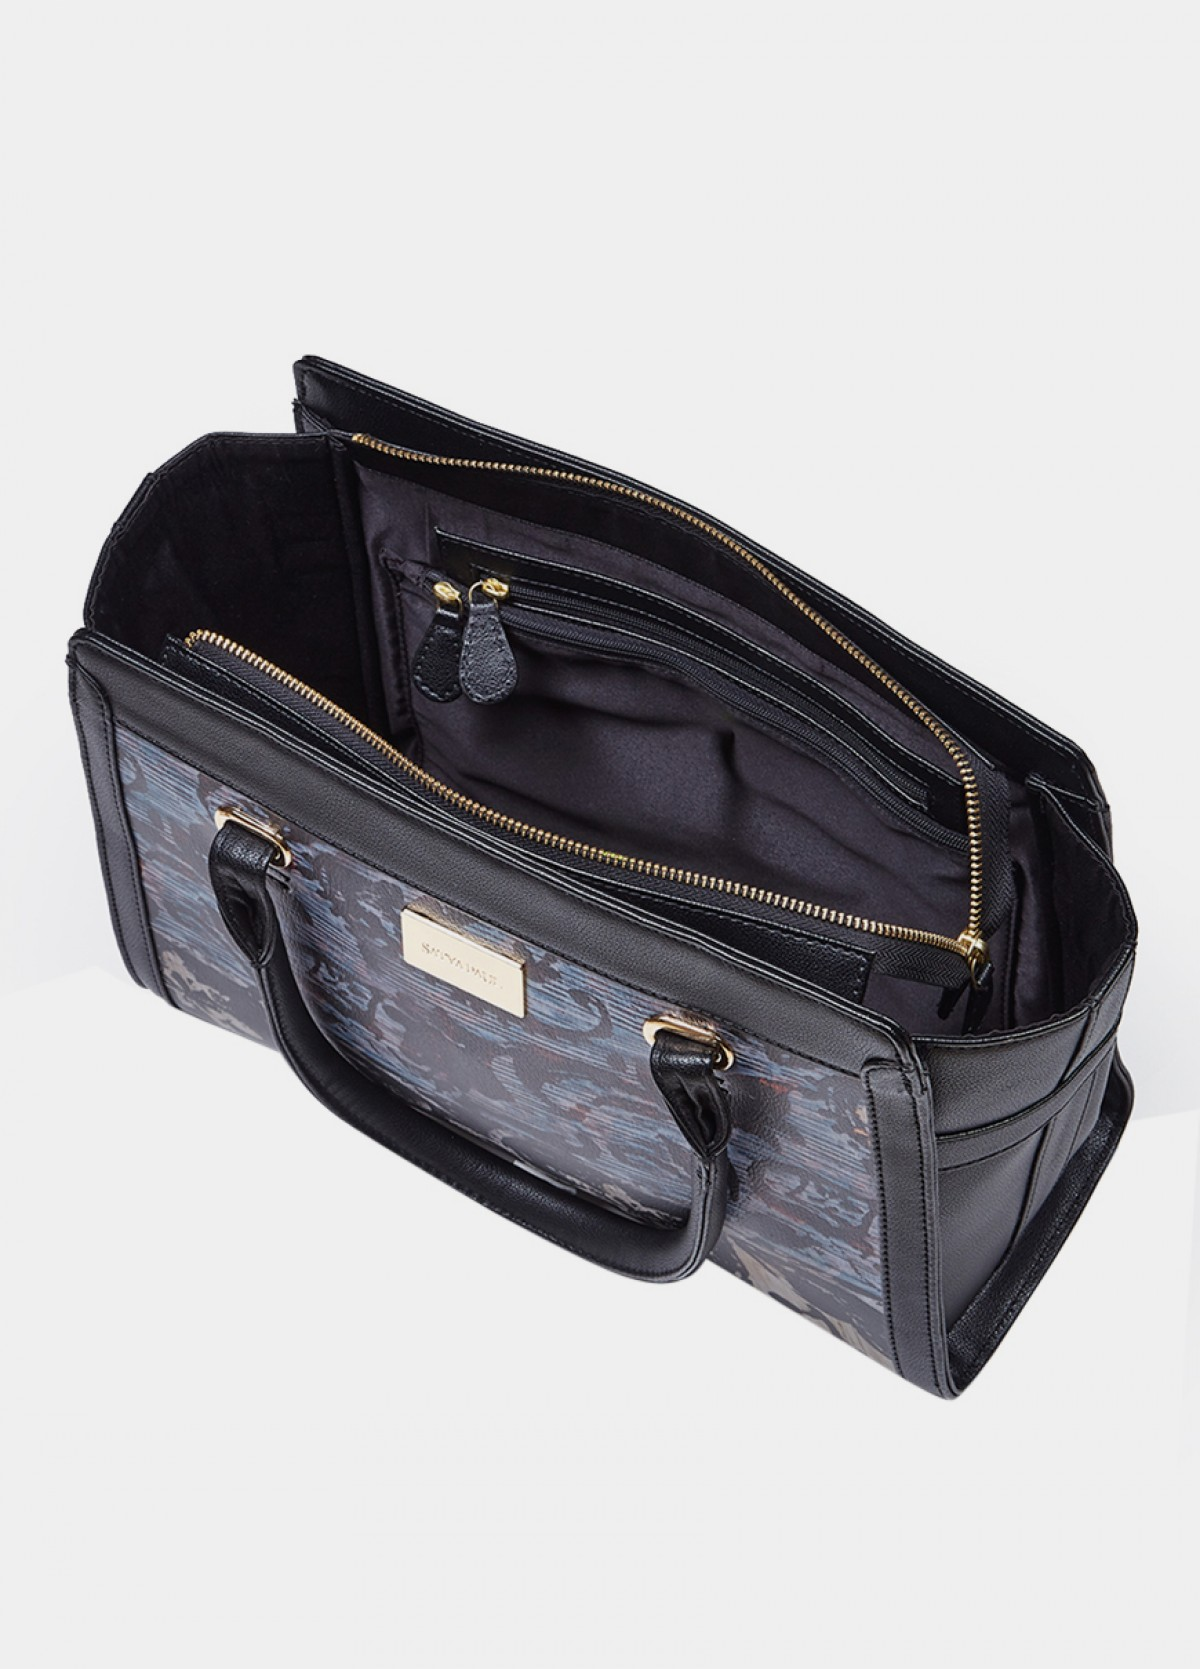 The Paisley Shoulder Bag